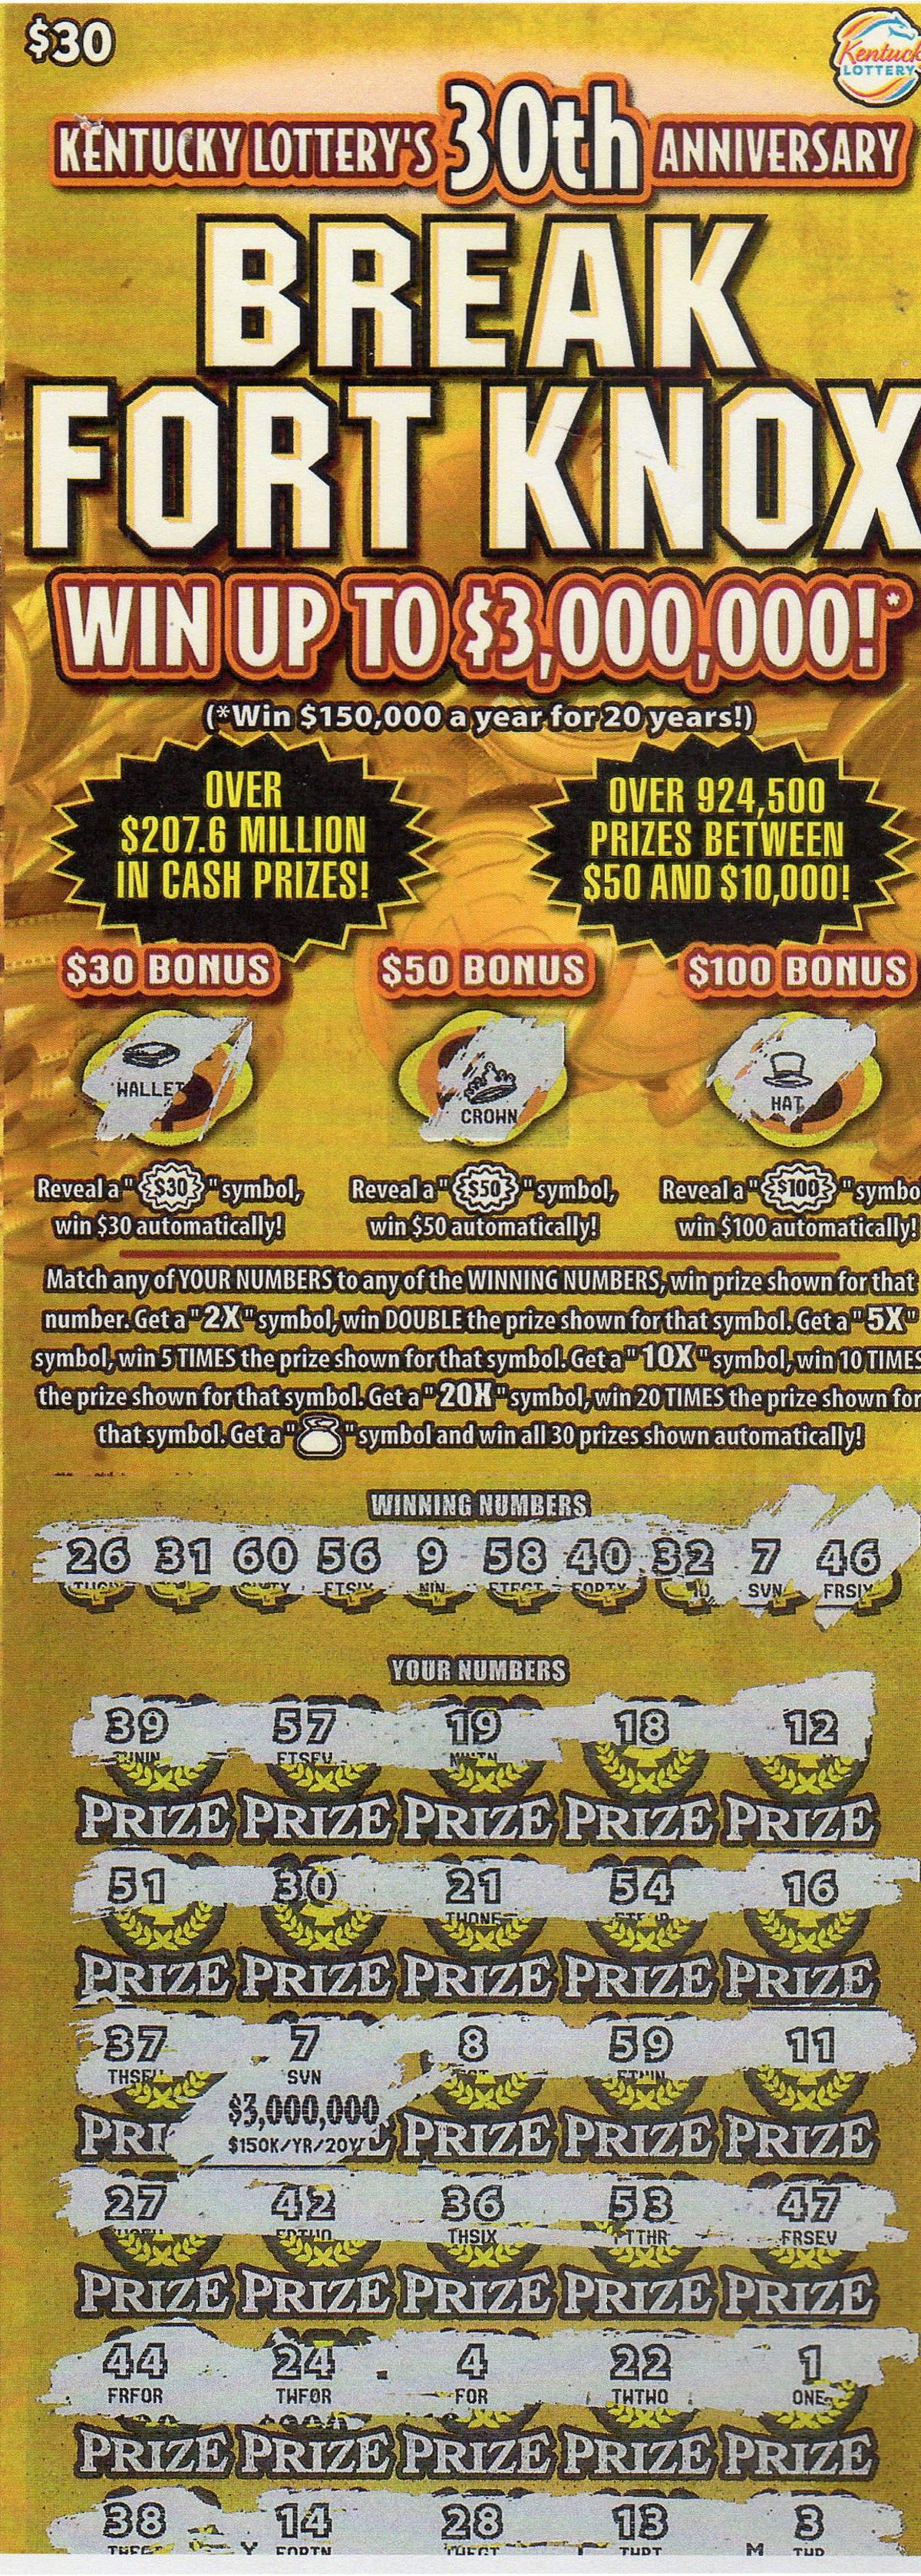 Kentucky Lottery sells $3 million Break Fort Knox ticket